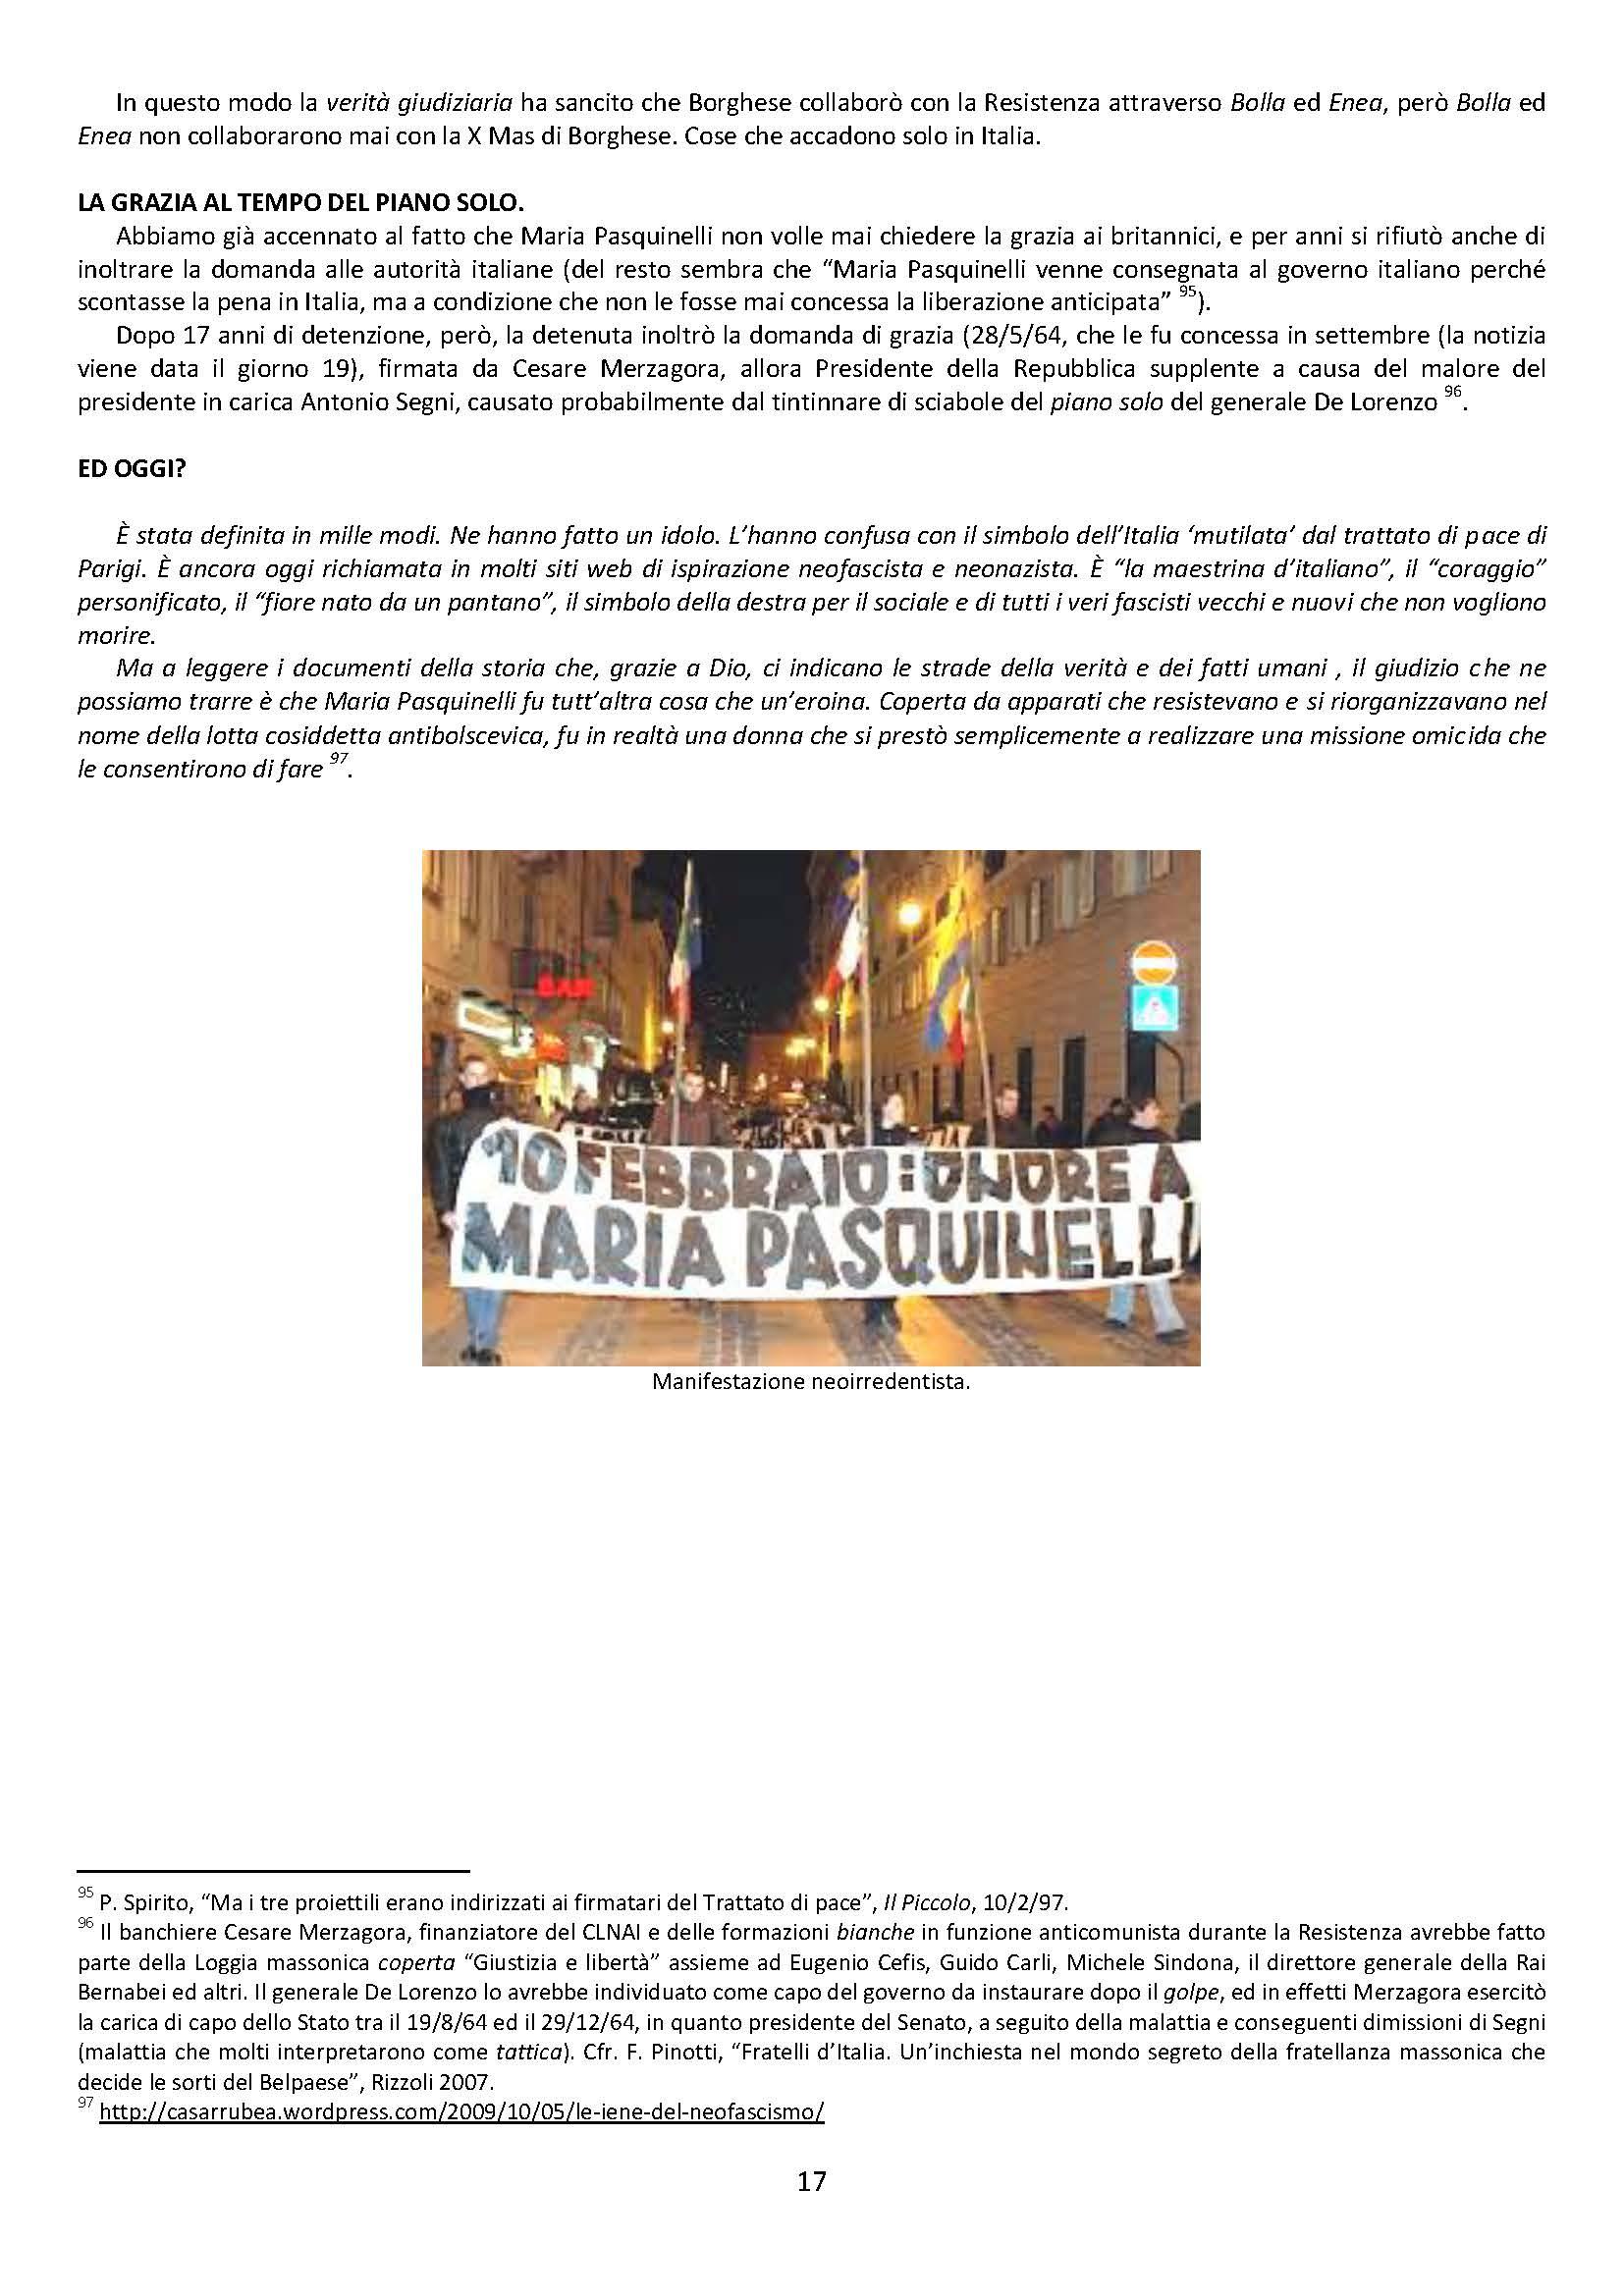 dossier-maria-pasquinelli_Page_17